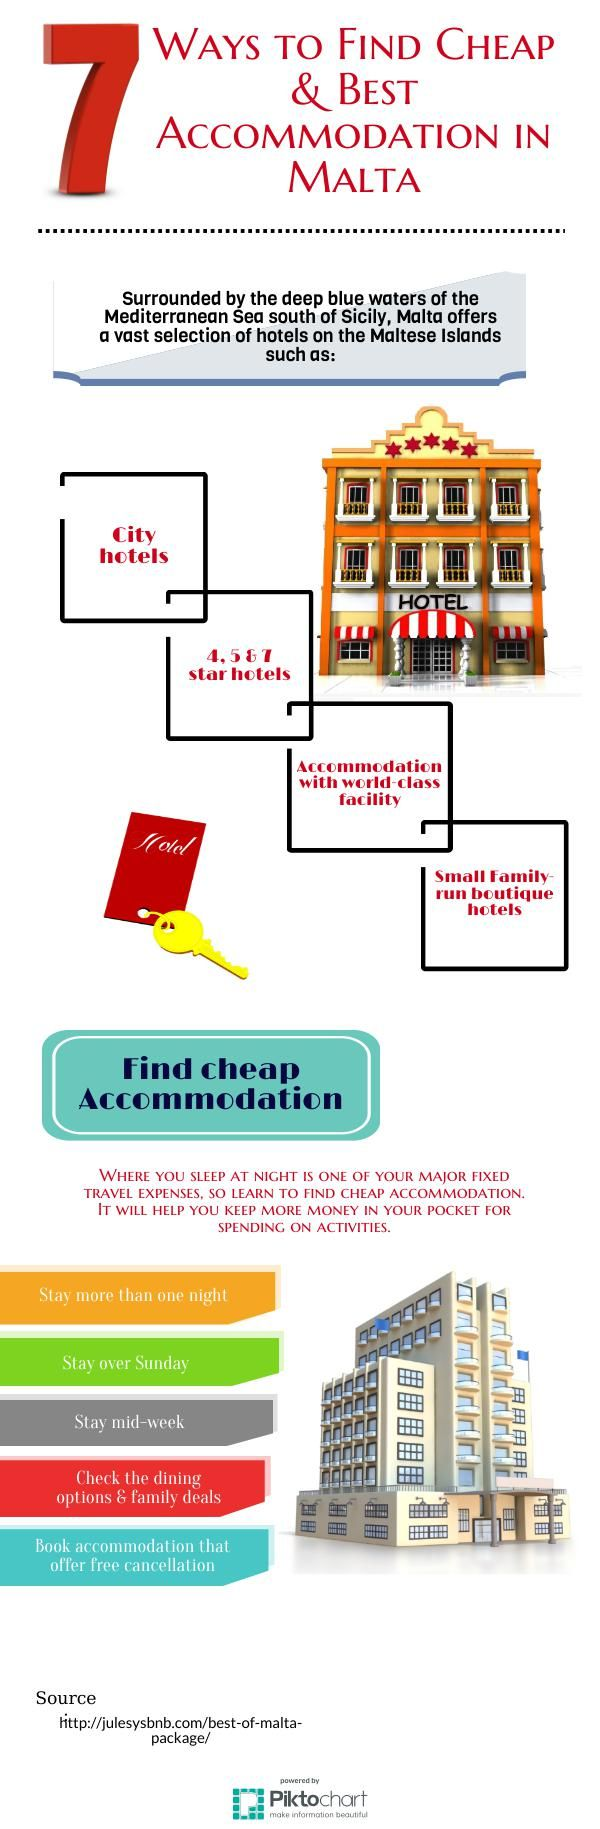 7 Ways to Find Cheap & Best Accommodation in Malta